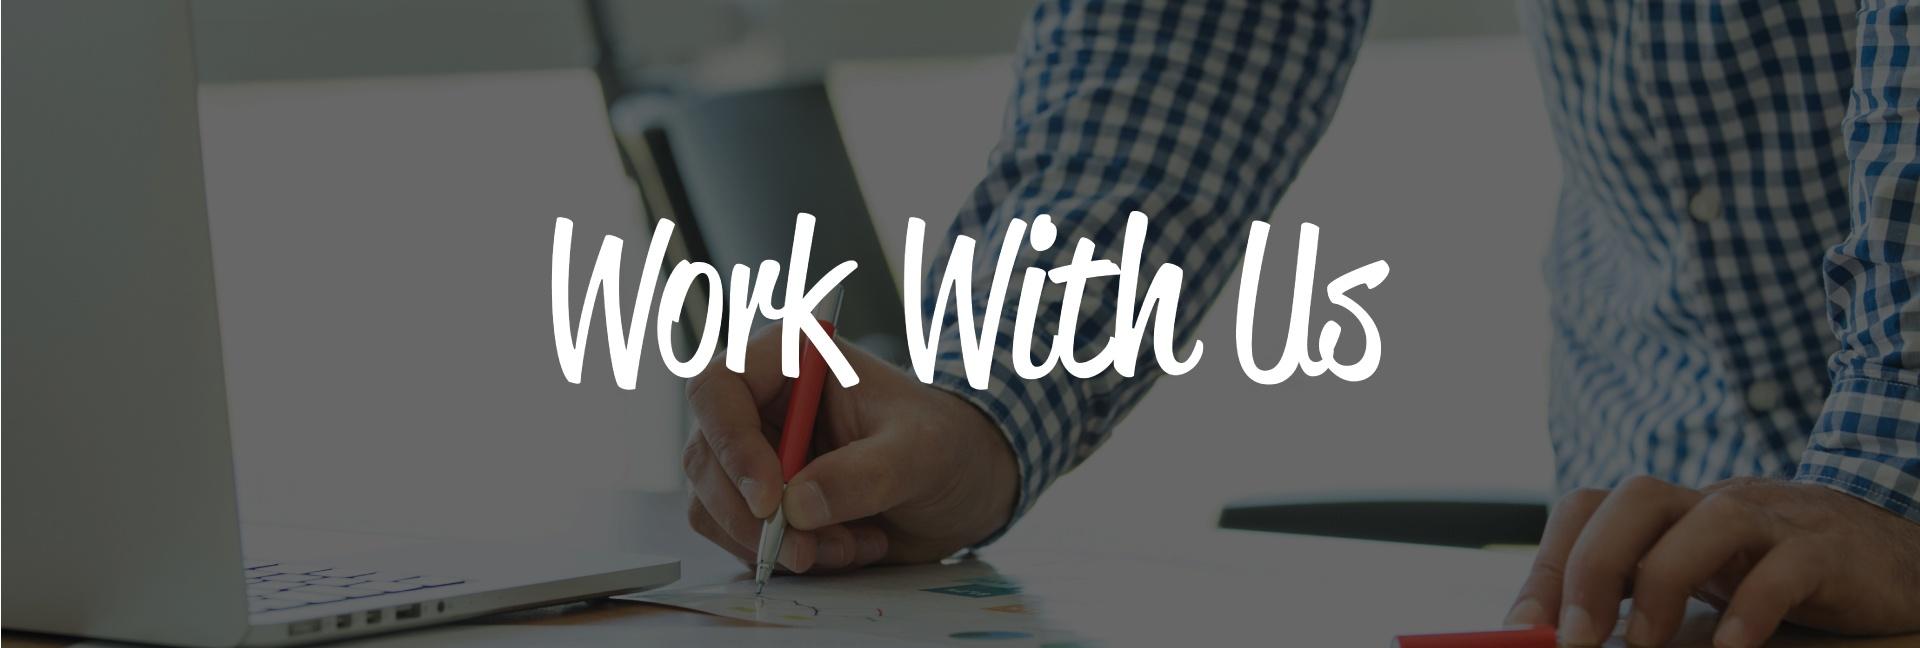 nuevo-work-with-us.jpg